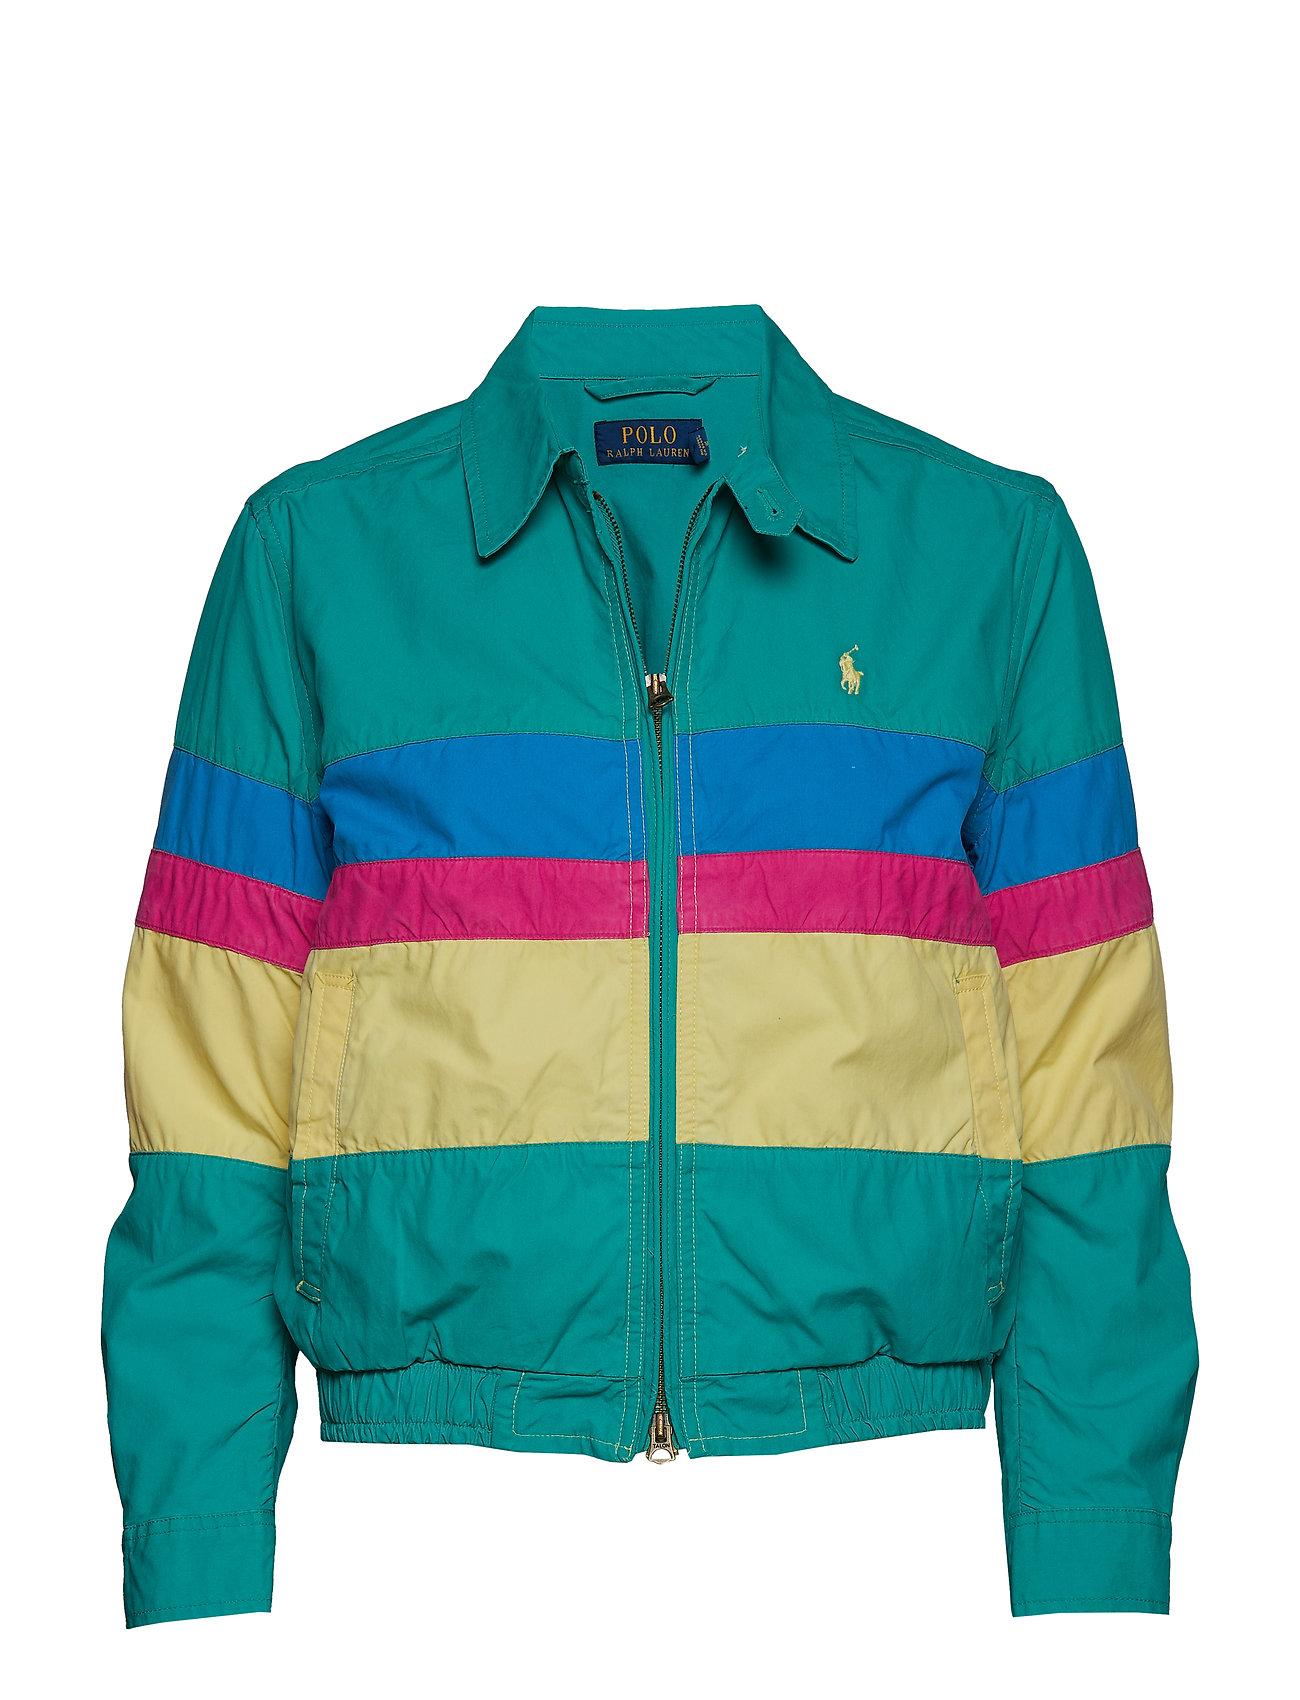 Jacket Jacket Windbreaker Windbreaker Jacket Windbreaker Poplin Poplin Poplin BCxroed